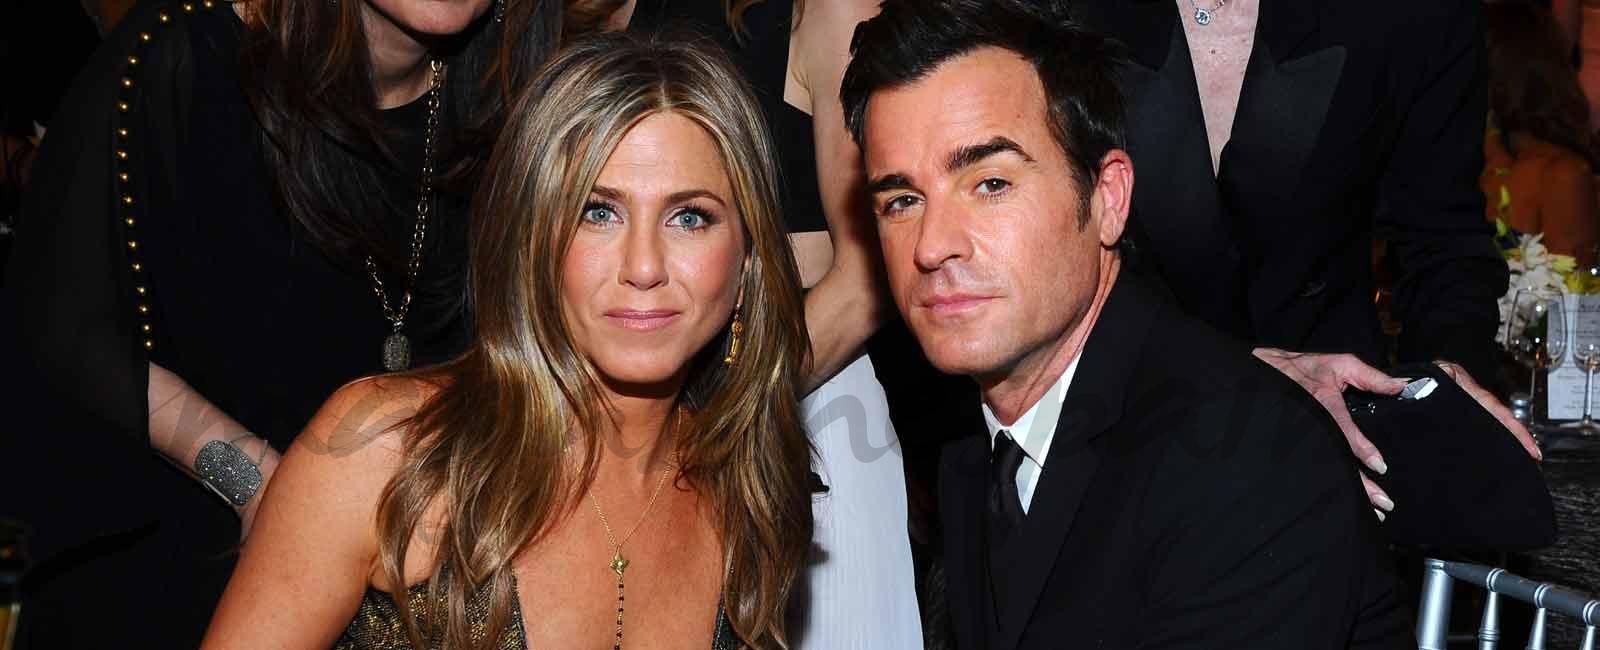 Las notas de amor de Brad Pitt a Jennifer Aniston que encontró su marido, Justin Theroux